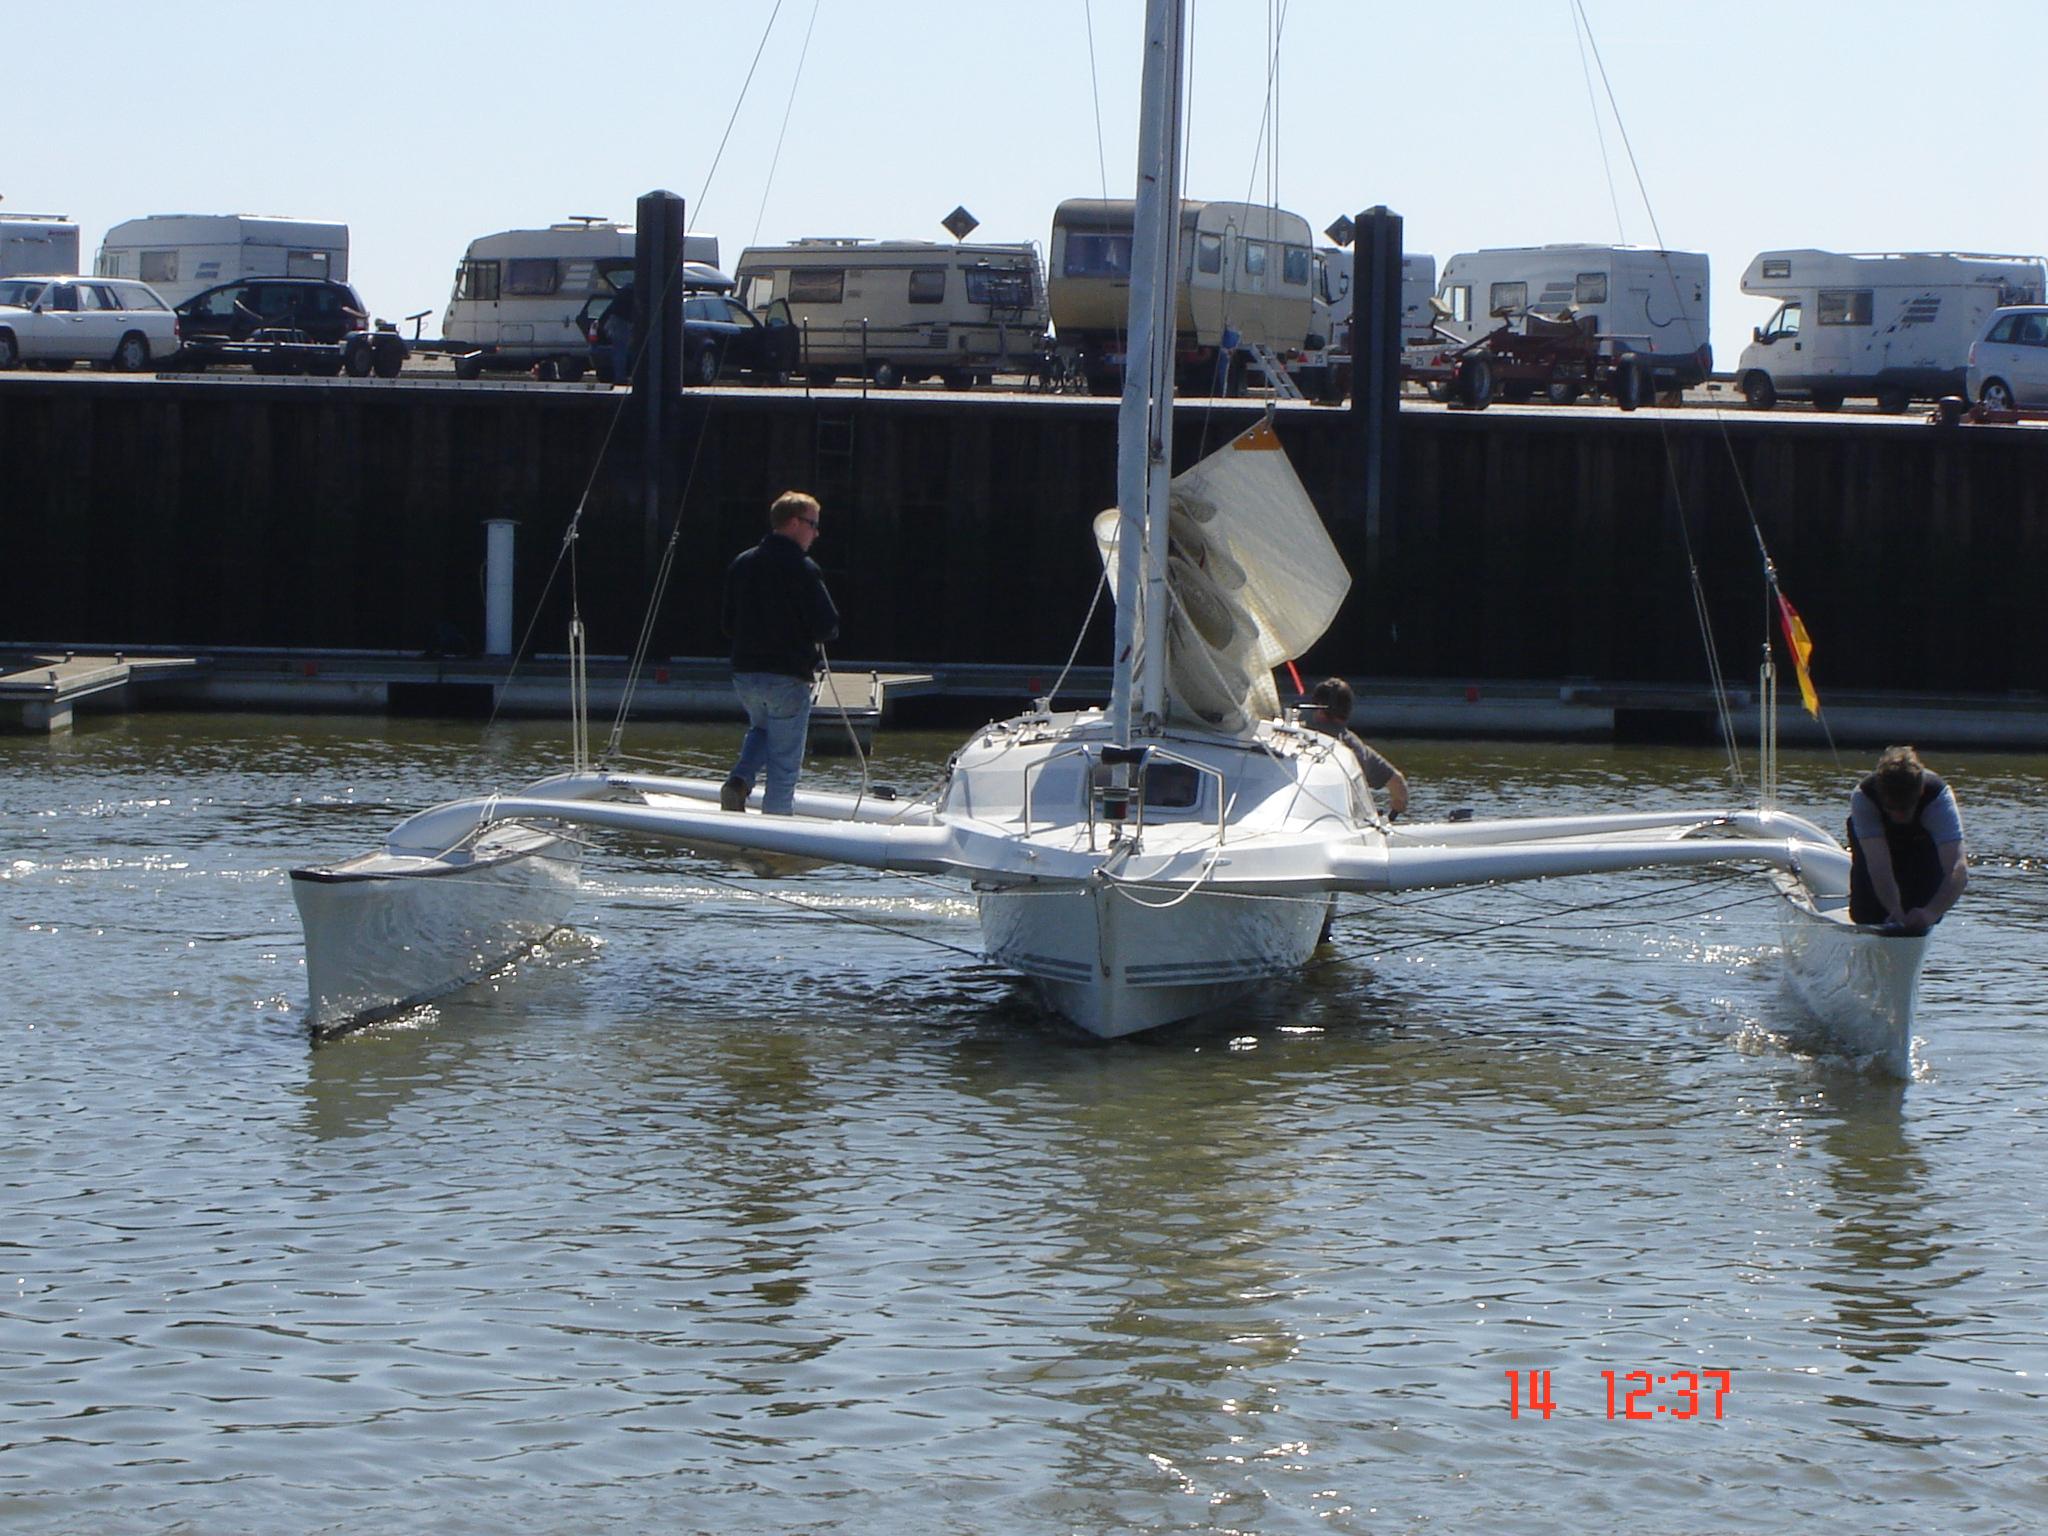 Dragonfly 800   spezialbootsbau de